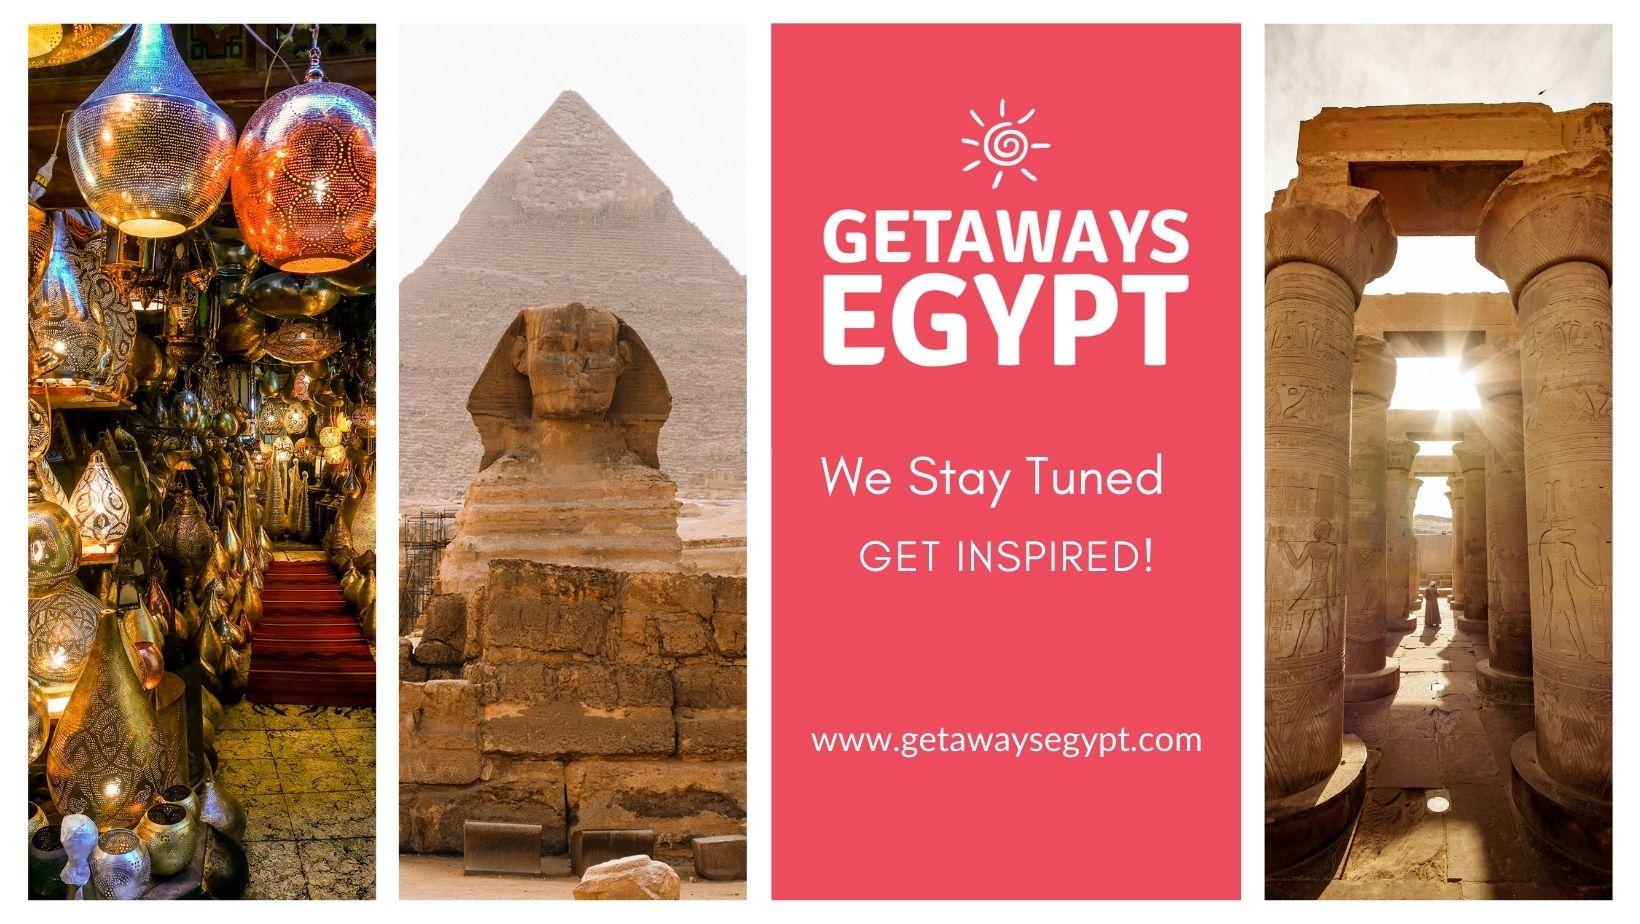 Jean Paul, Getaways Egypt, Cairo, Egypt